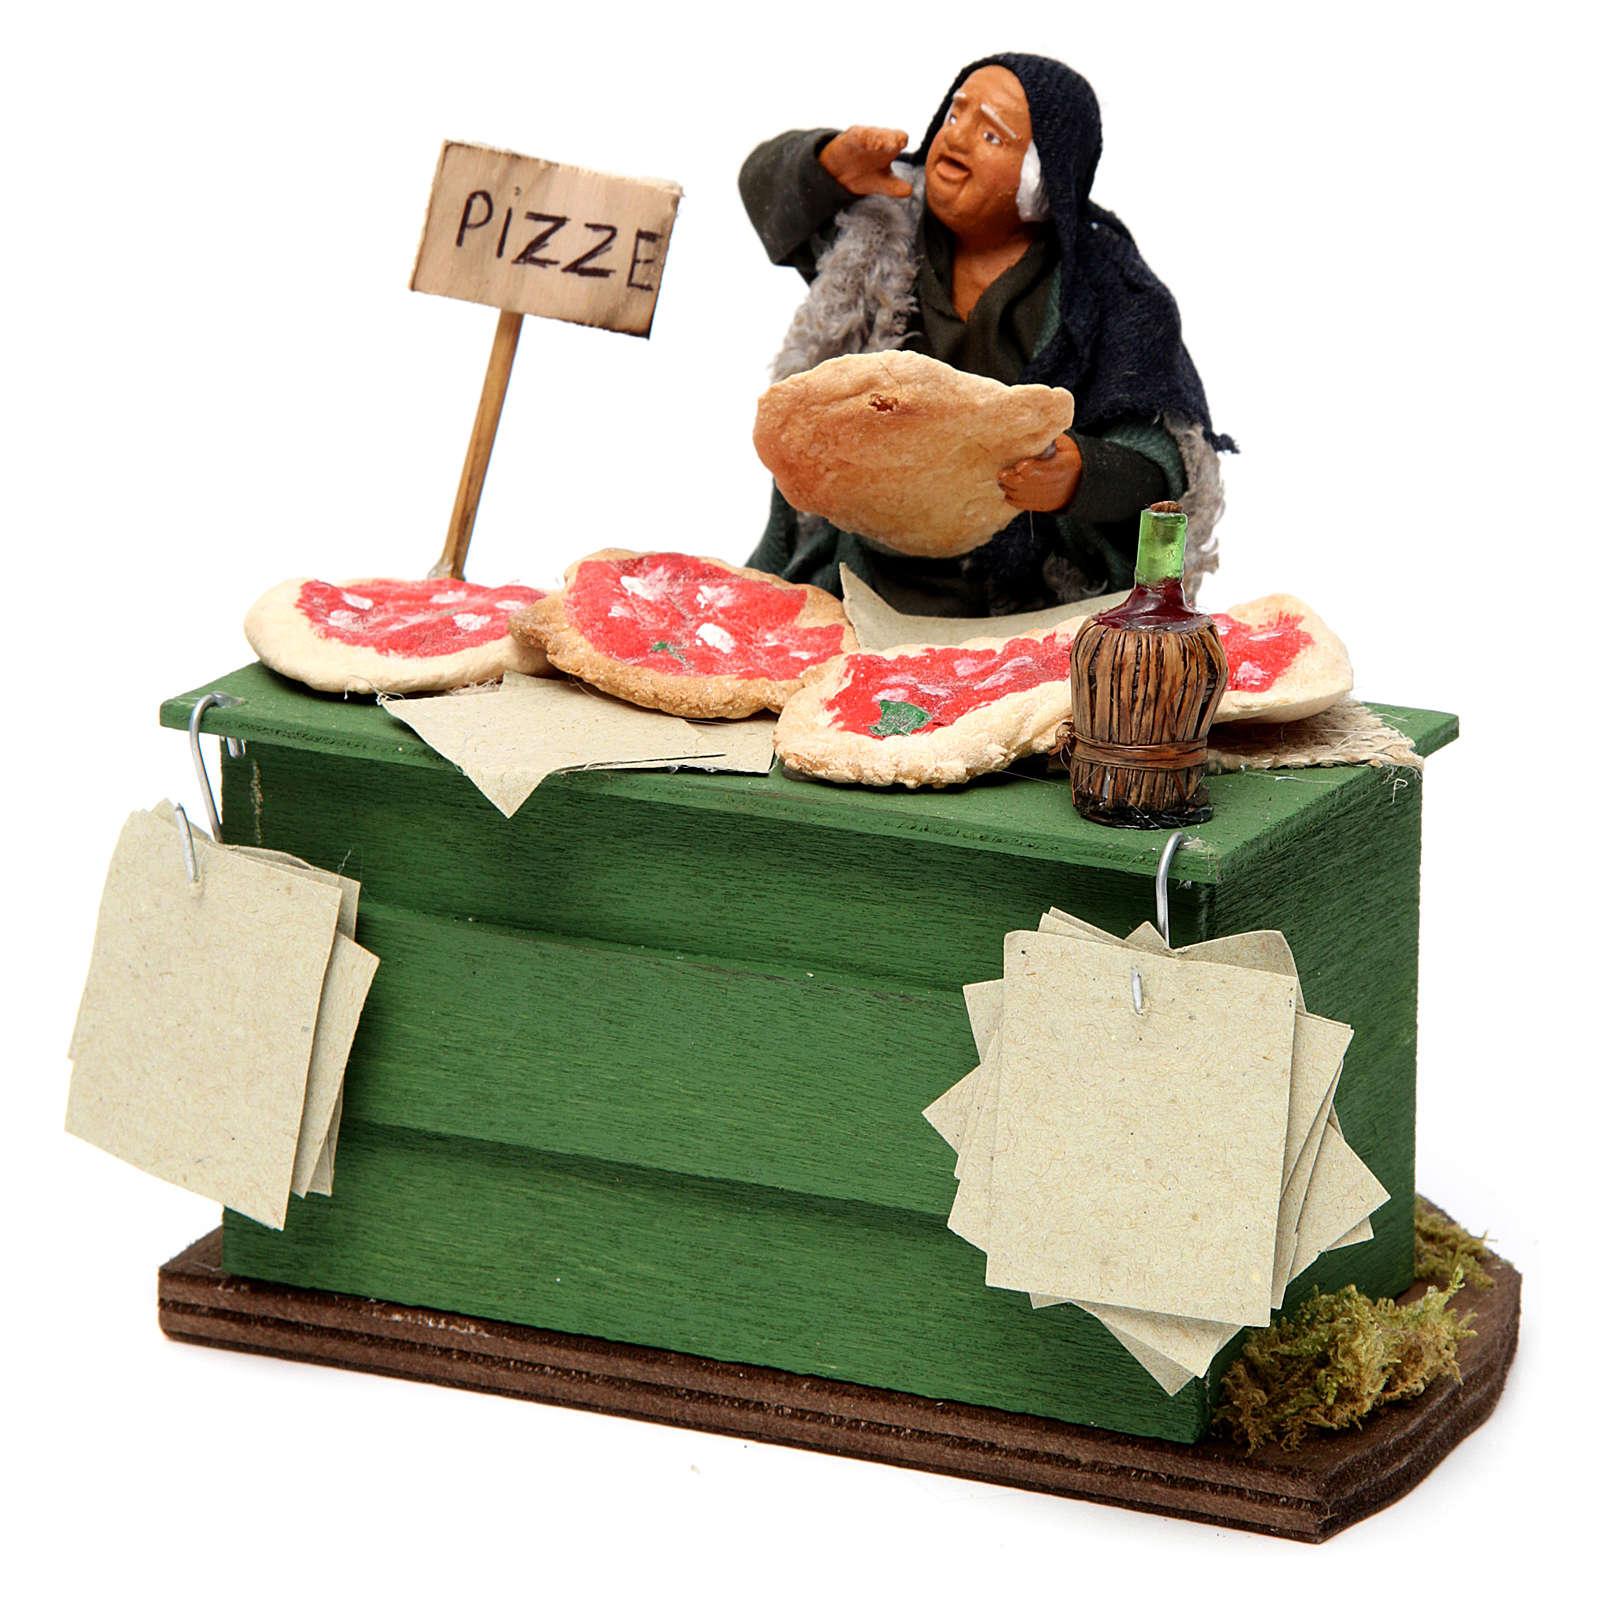 Pizza Maker from Naples 12 cm 4